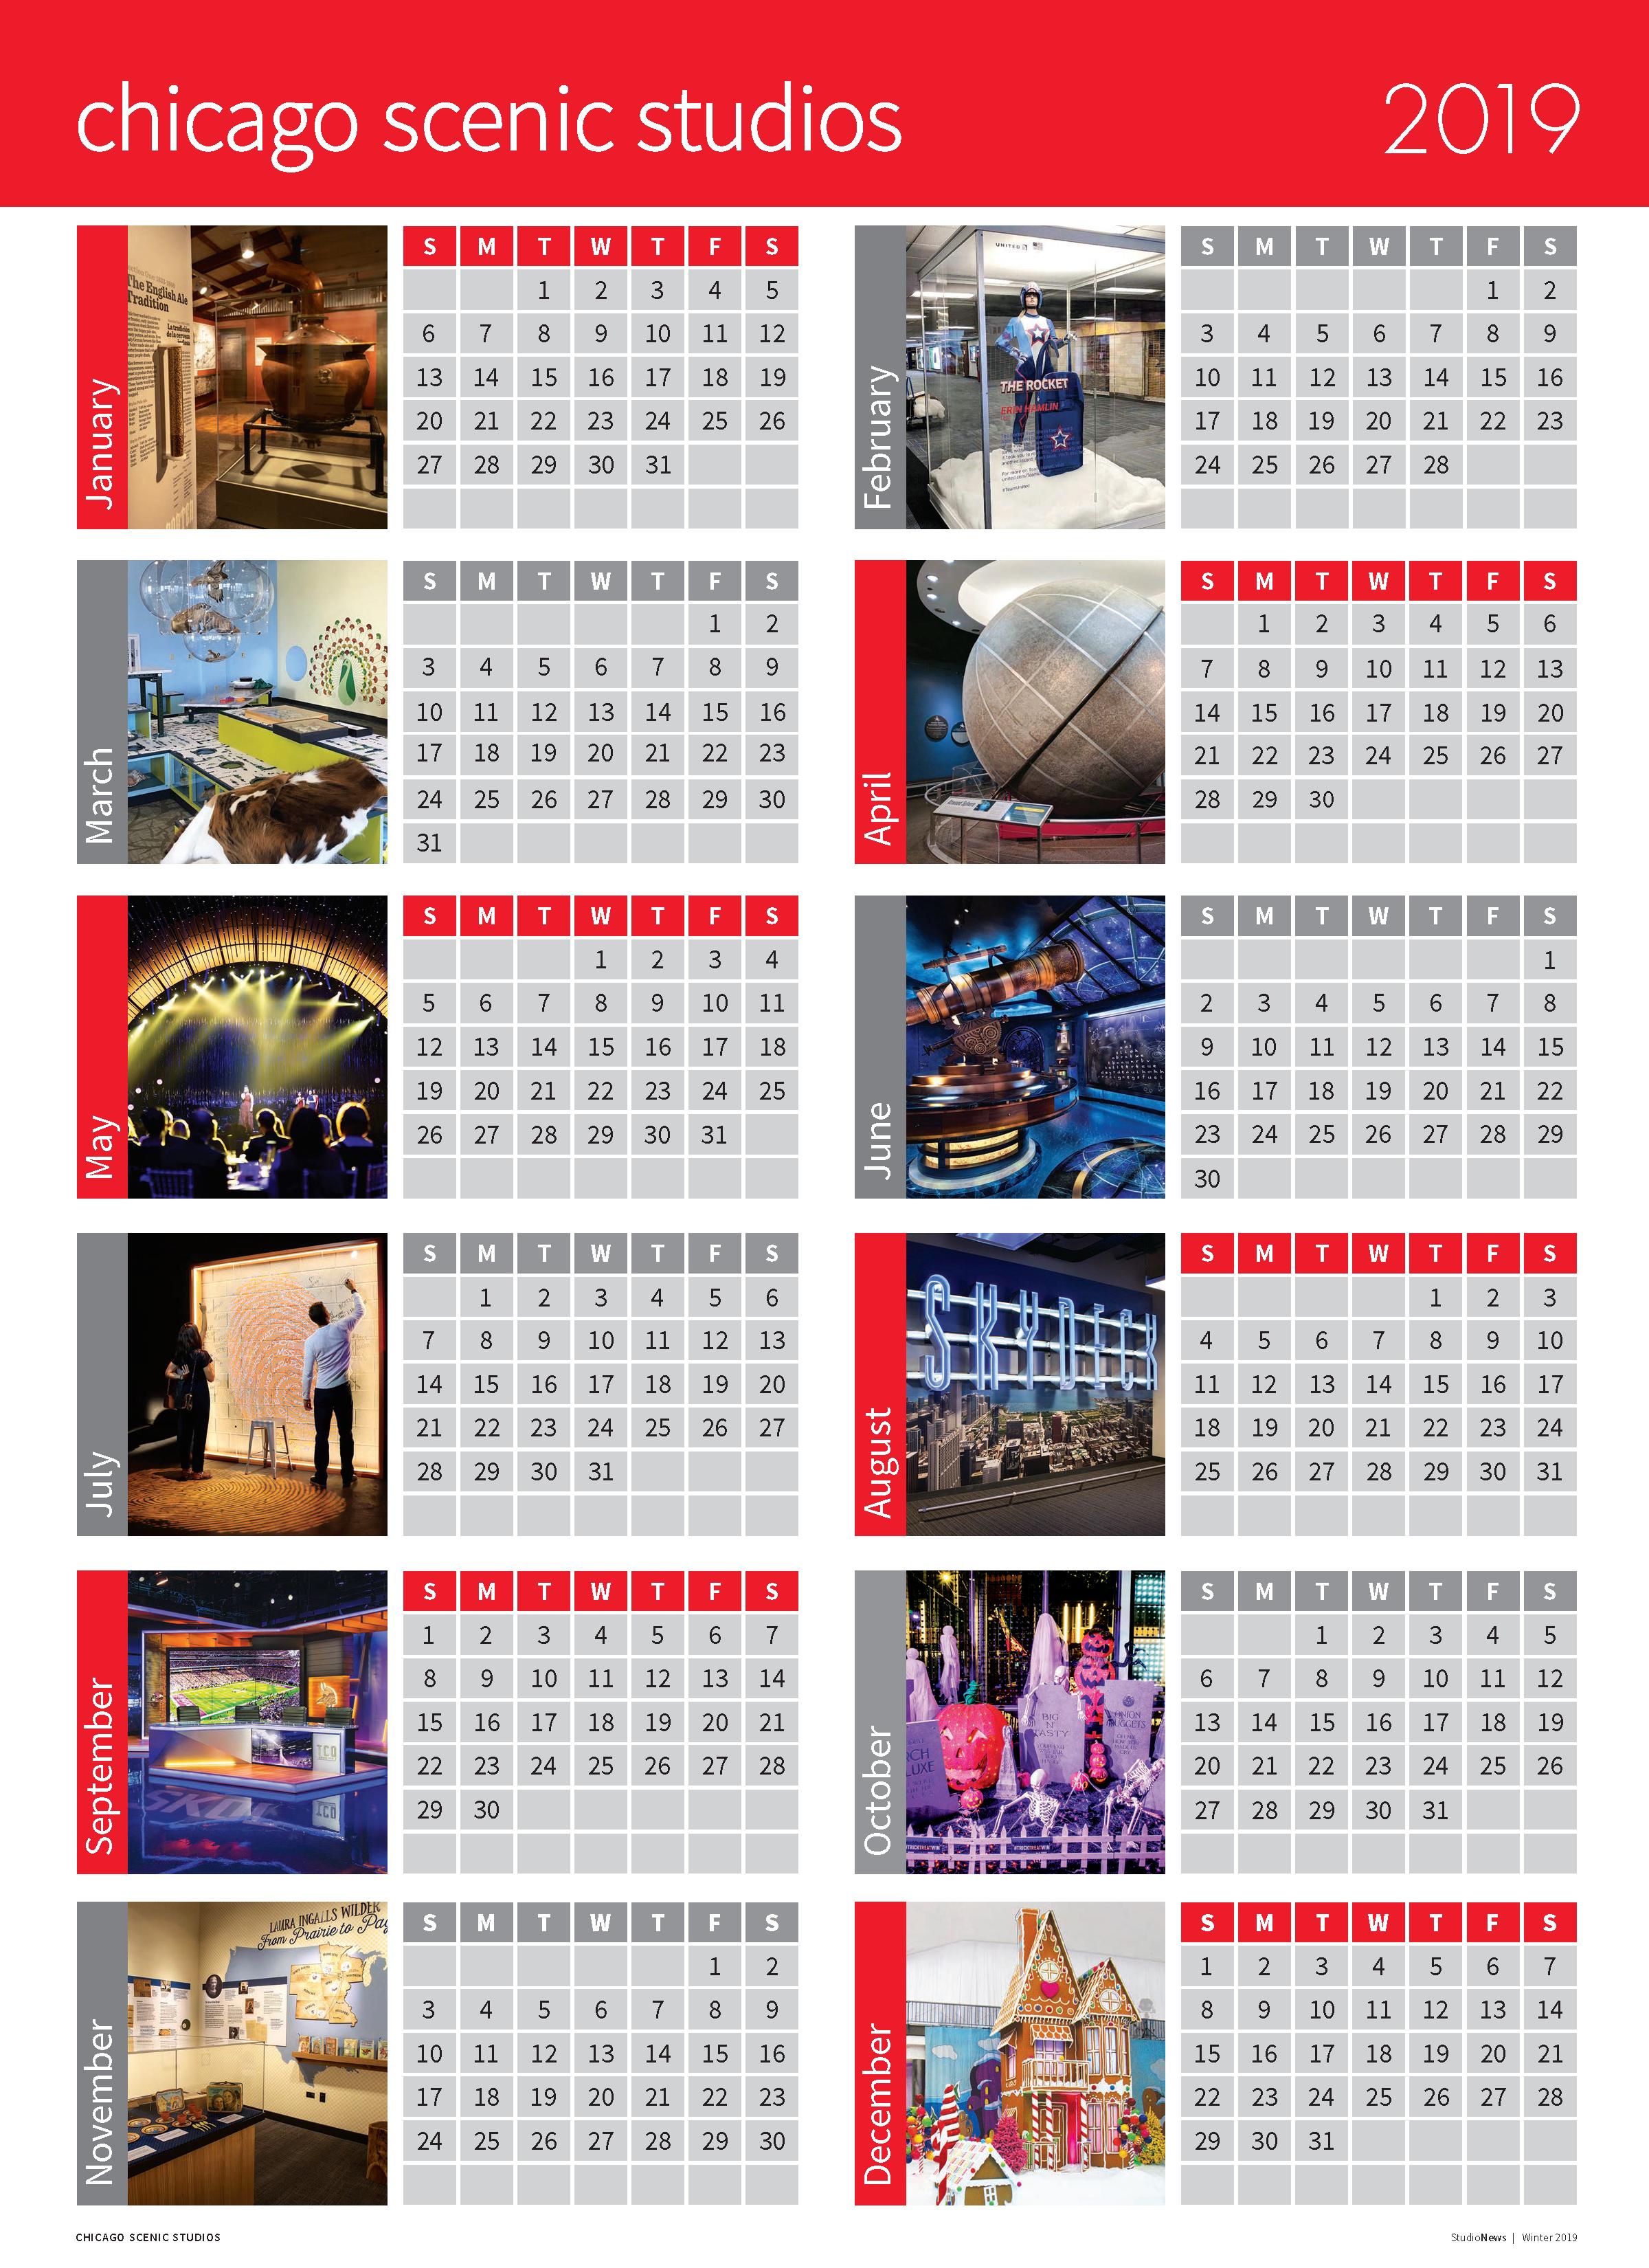 2019 StudioNews Calendar